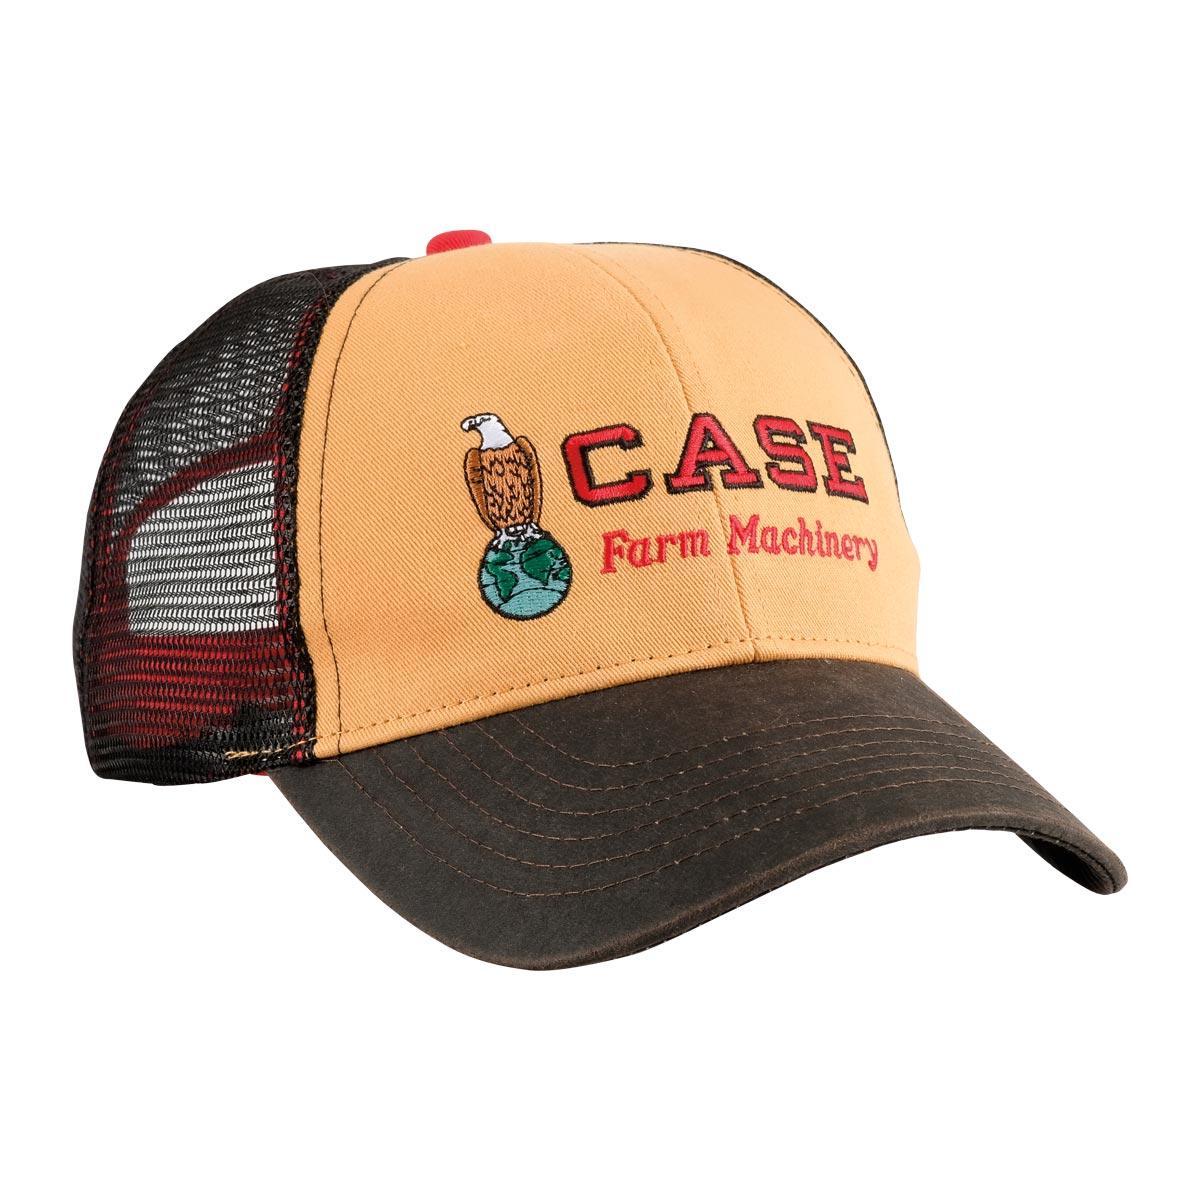 Case Tractor Hat Tire Tread Logo Black Mesh